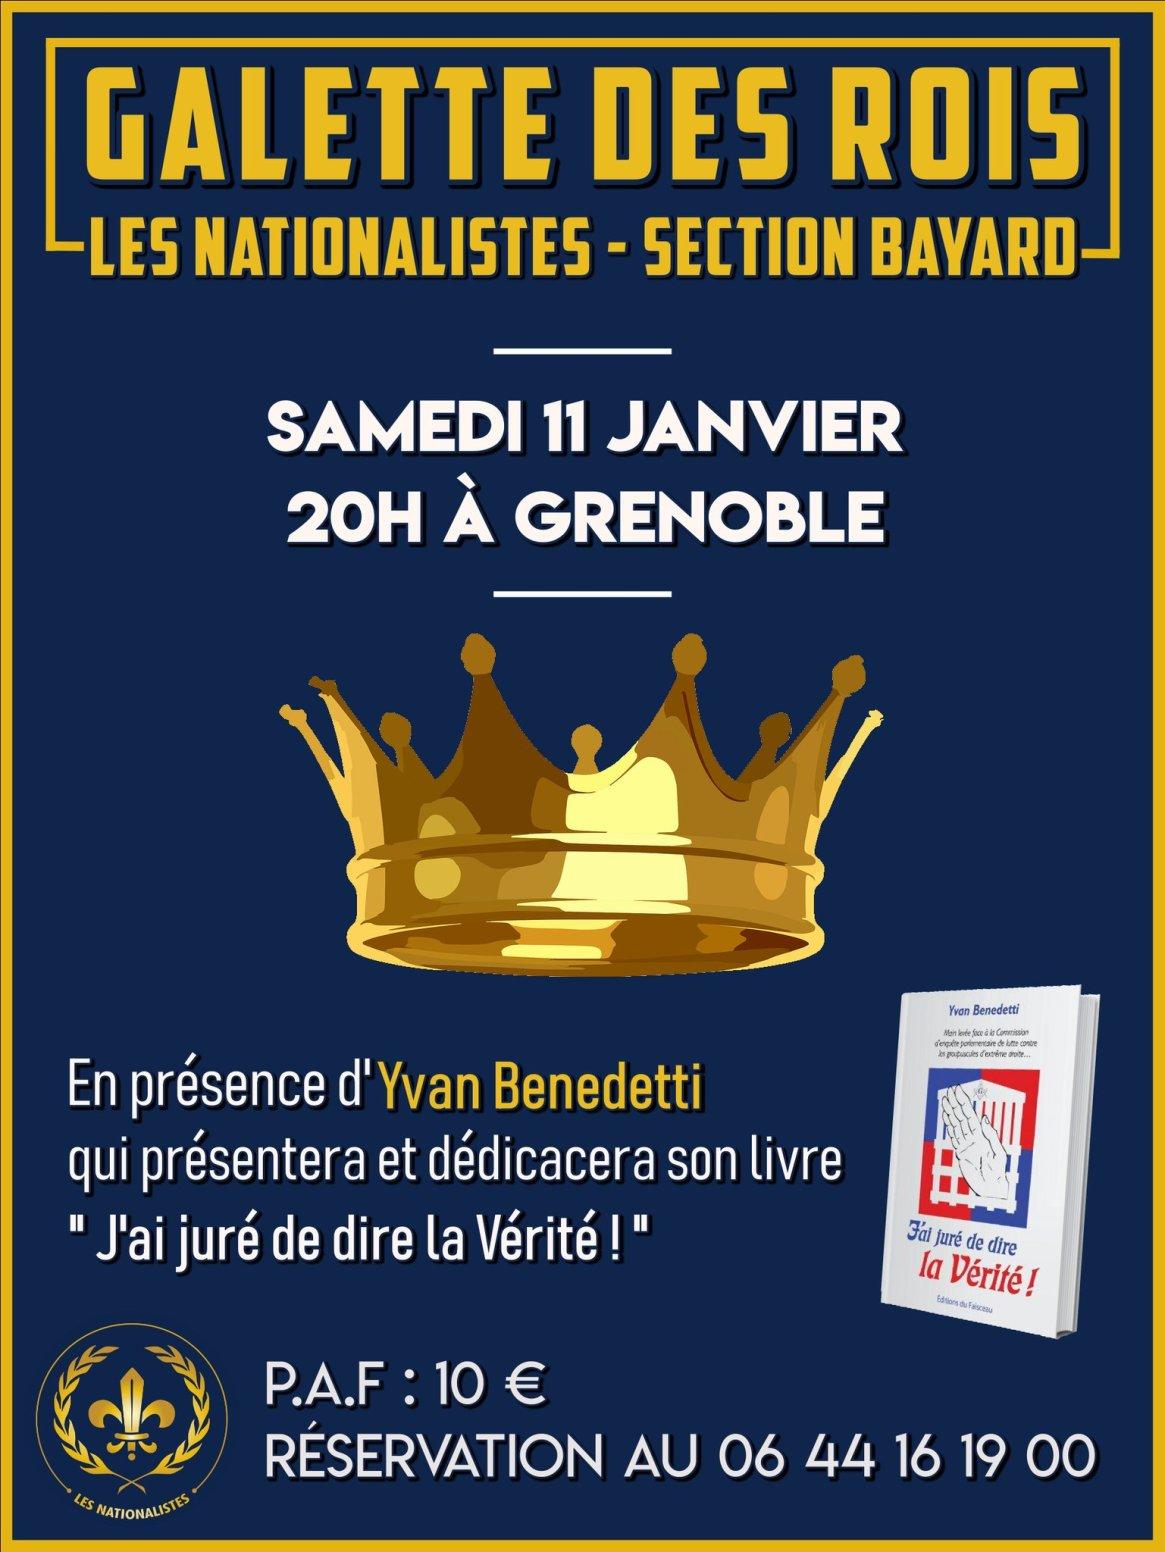 galette-des-rois-grenoble-11-01-2020